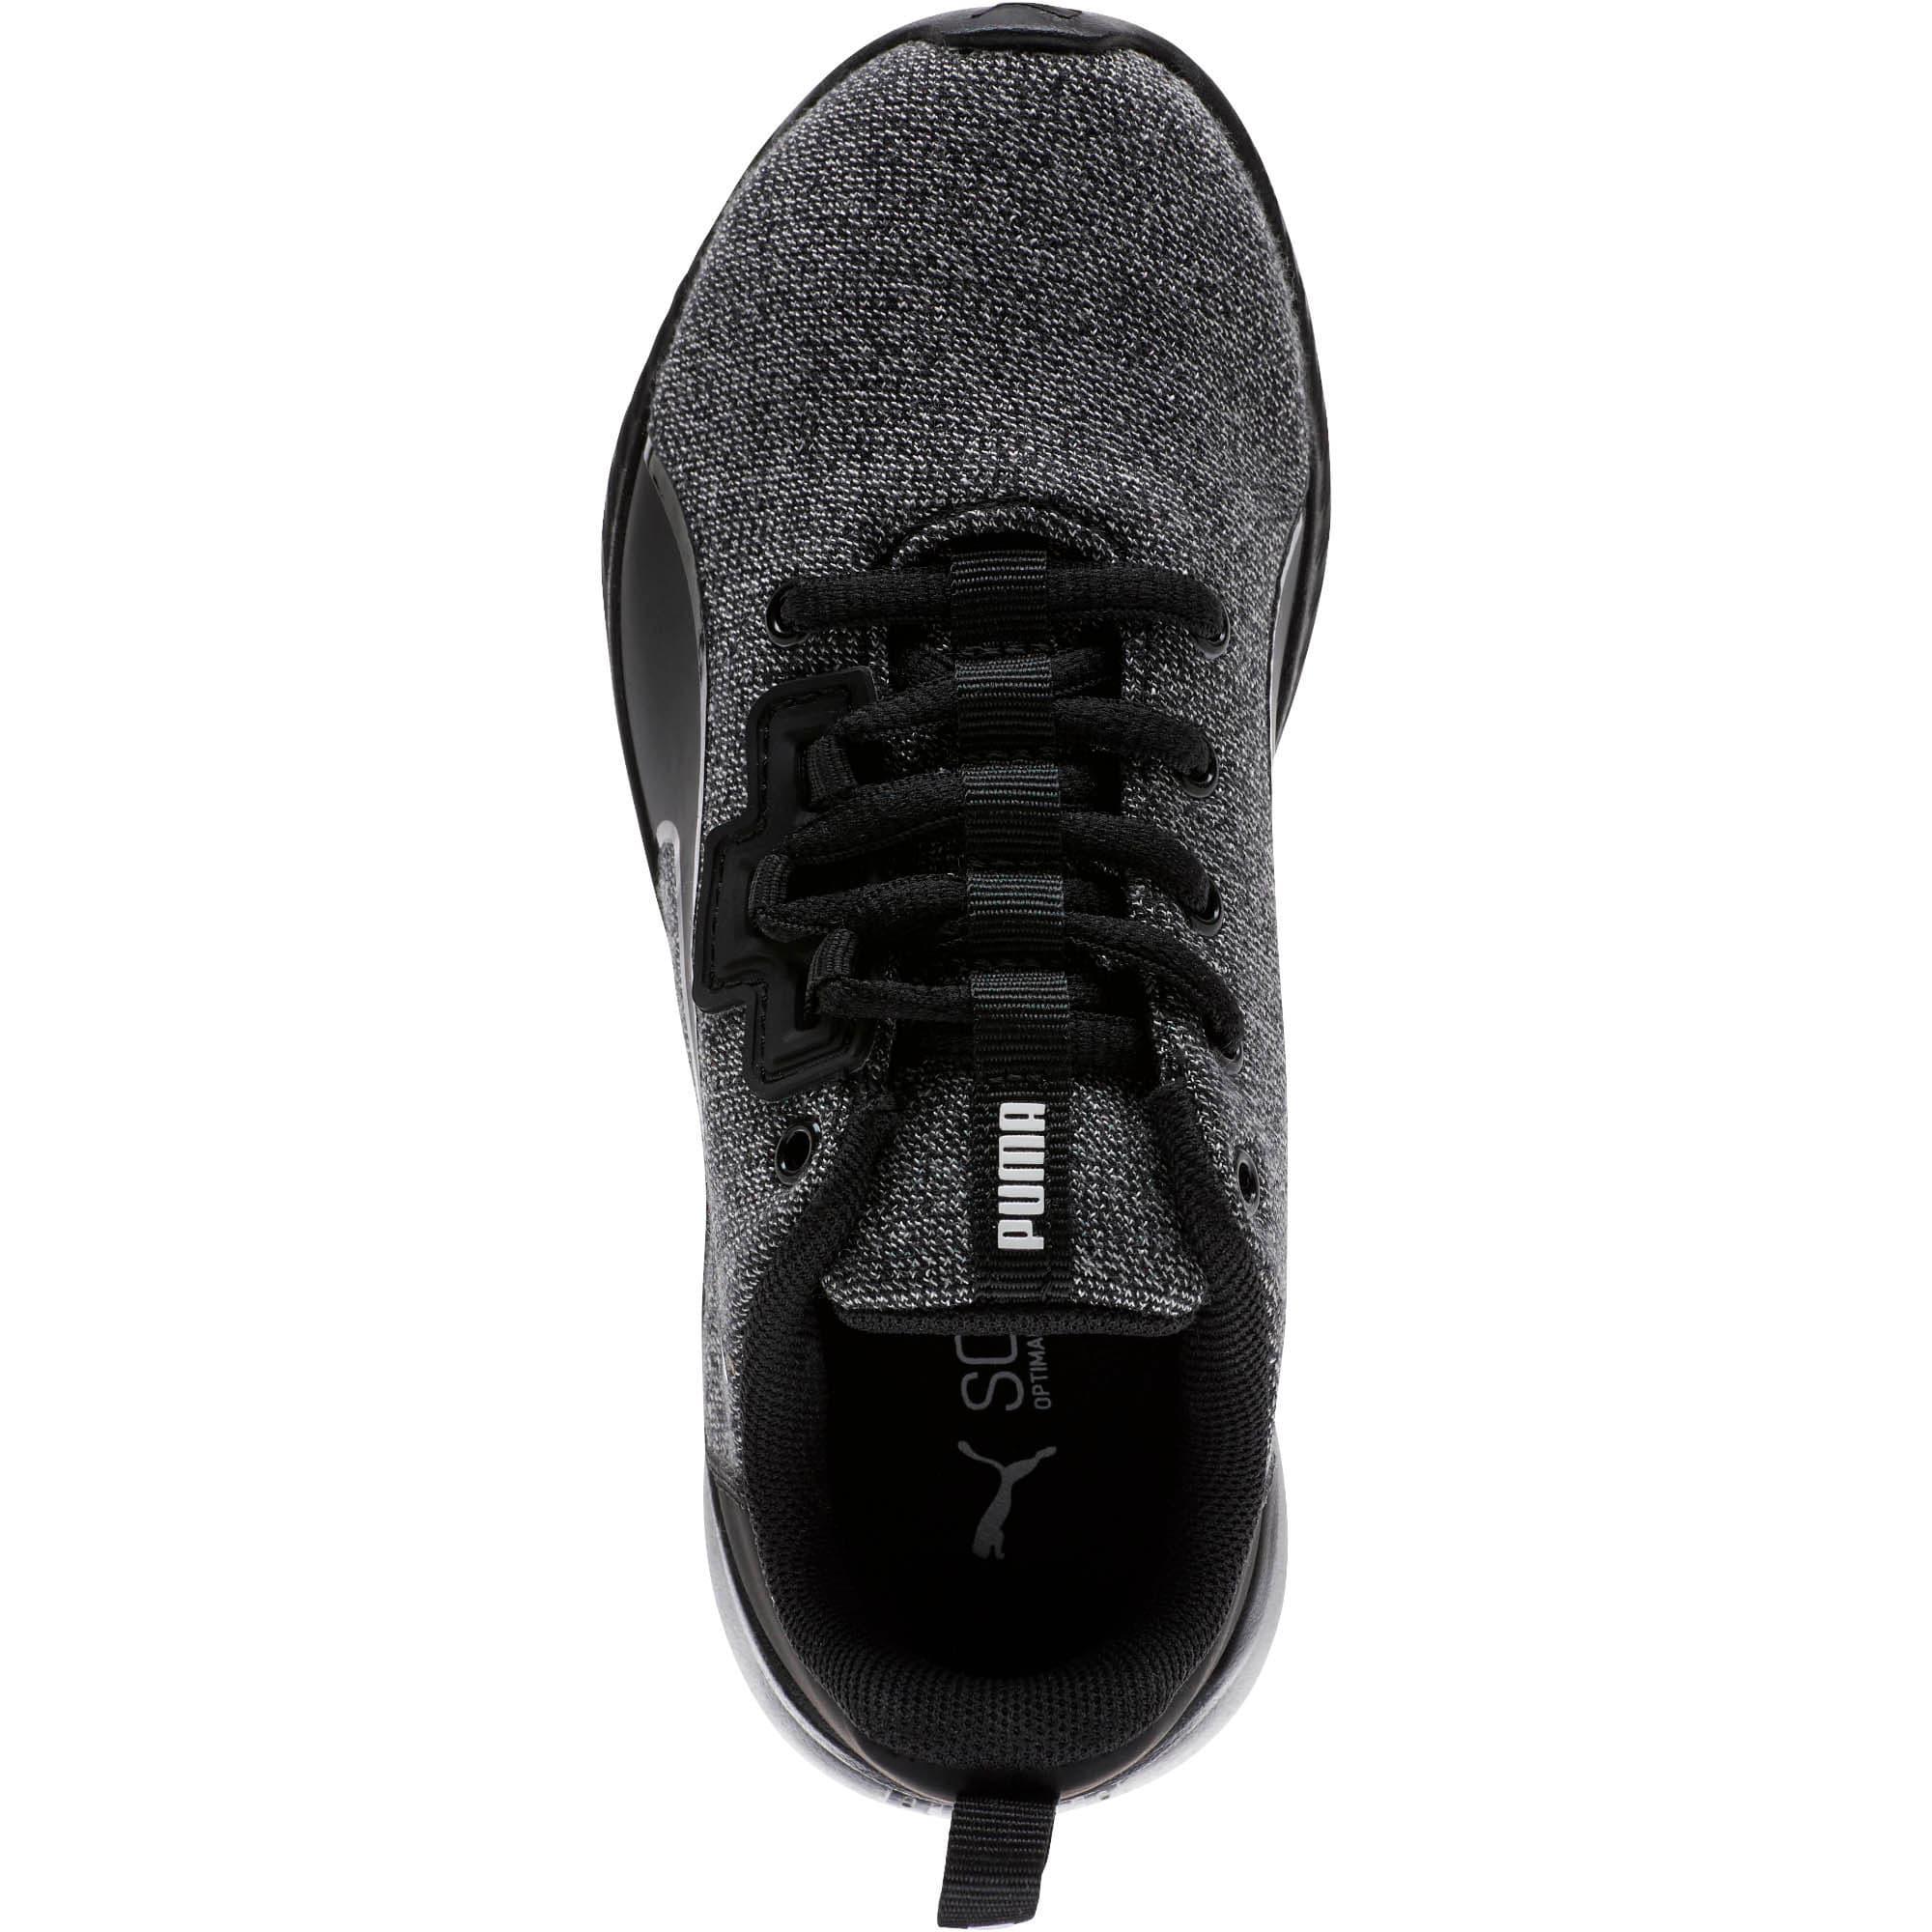 Thumbnail 5 of Tishatsu Runner Knit Little Kids' Shoes, Puma Black-Puma White, medium